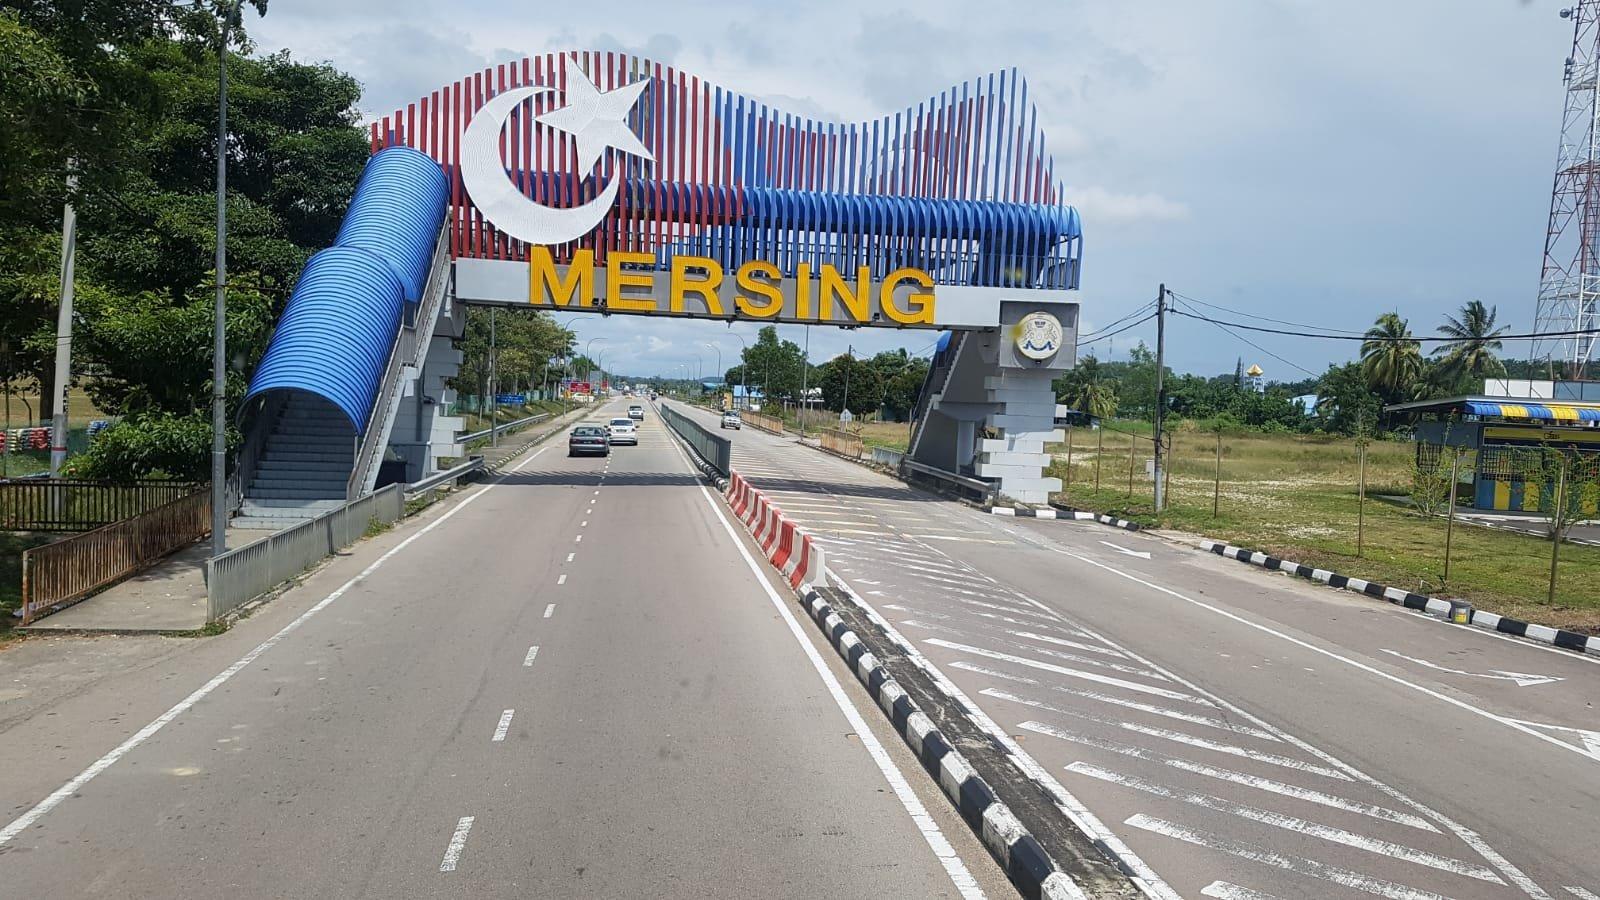 Mersing